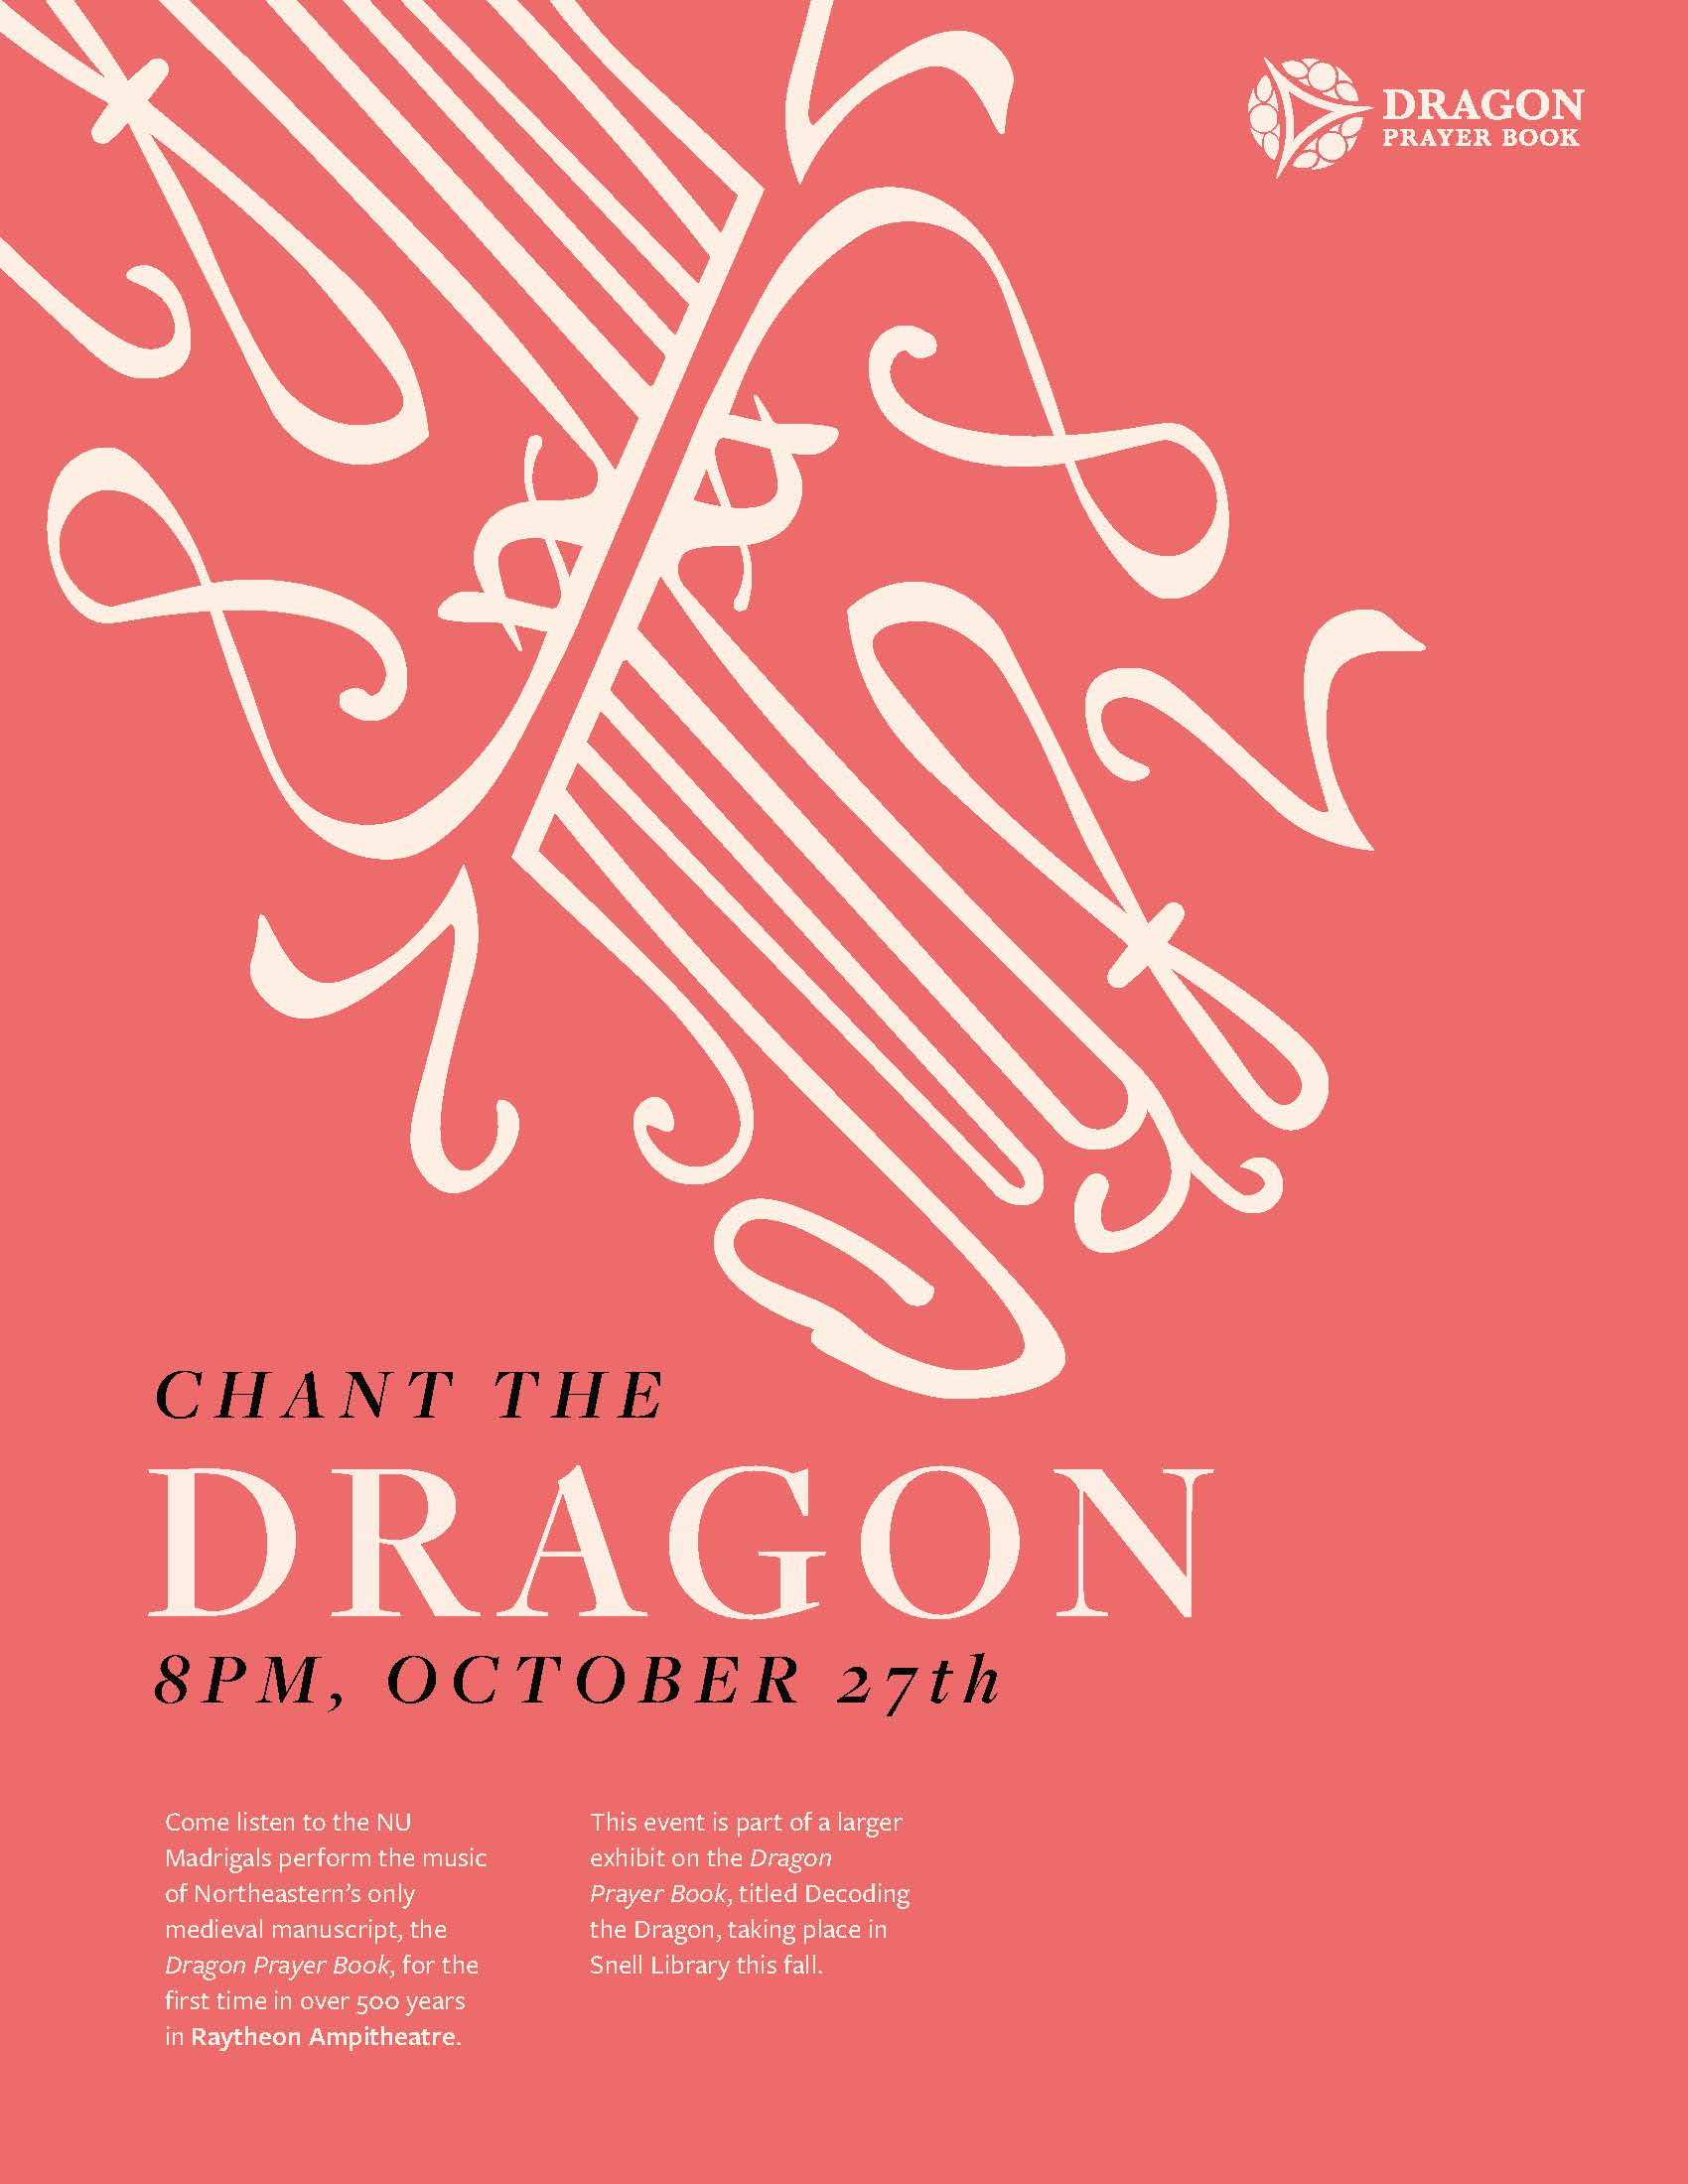 Chant the Dragon